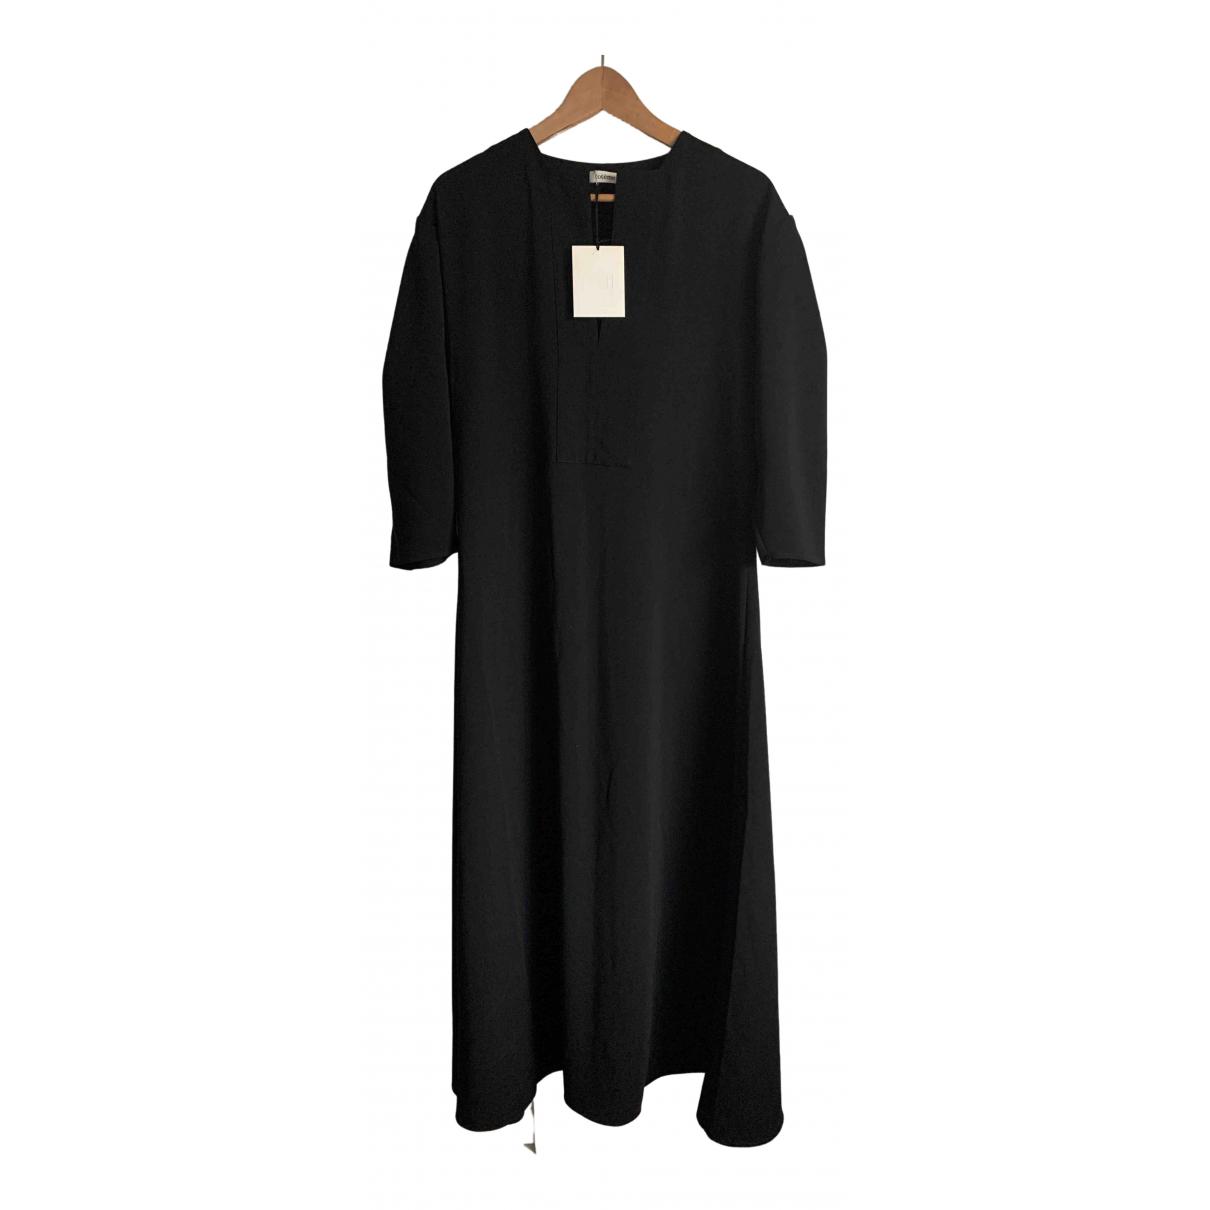 Toteme \N Kleid in  Schwarz Polyester